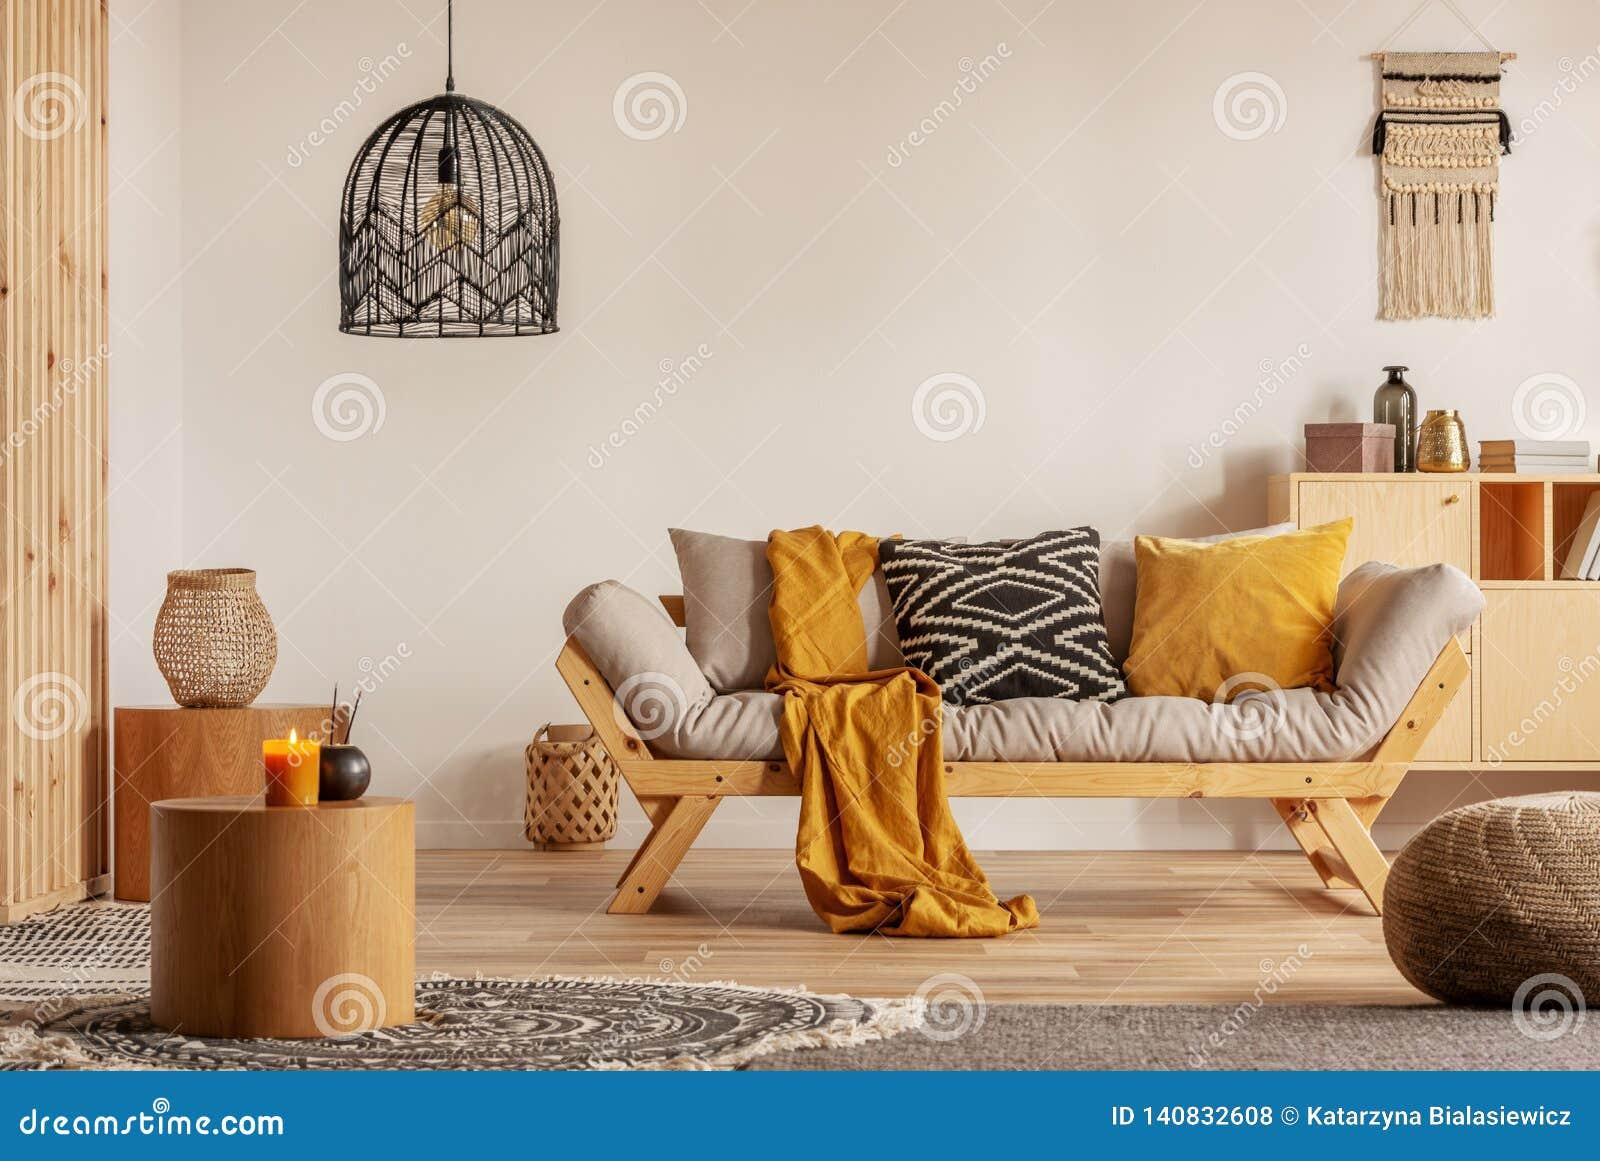 Wondrous Scandinavian Sofa With Pillows And Dark Yellow Blanket In Dailytribune Chair Design For Home Dailytribuneorg